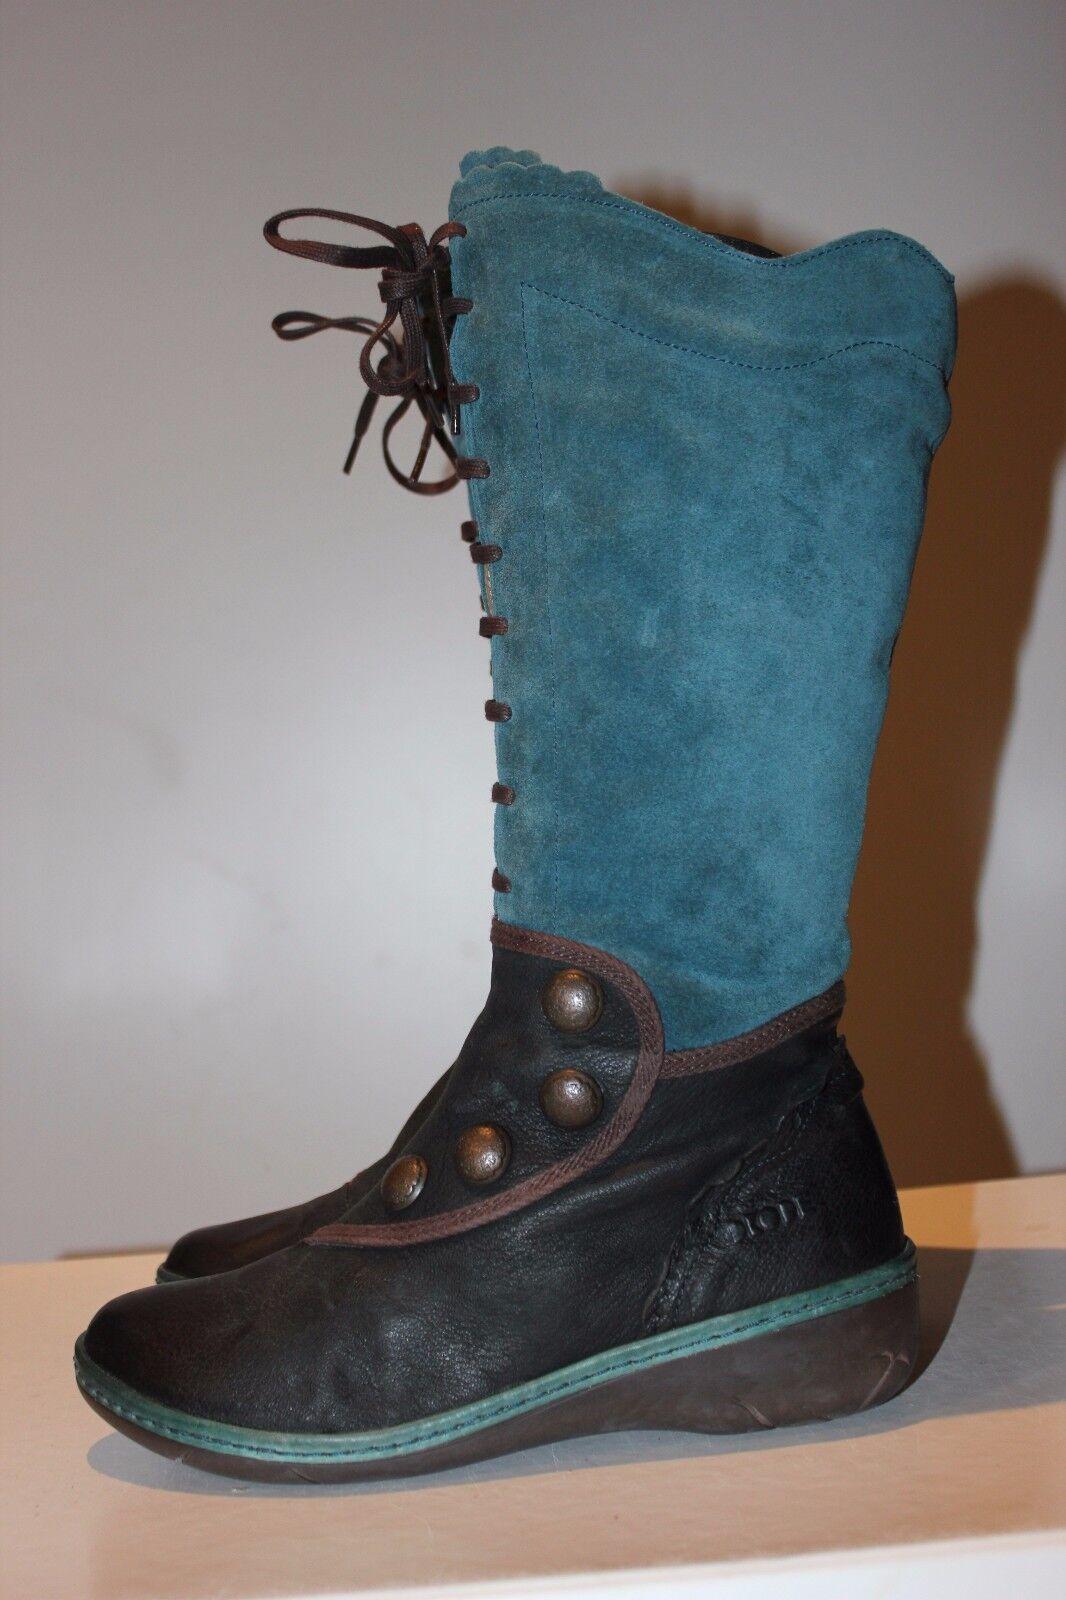 DKODE super bonito azul + Negro botas de cuero, impecable